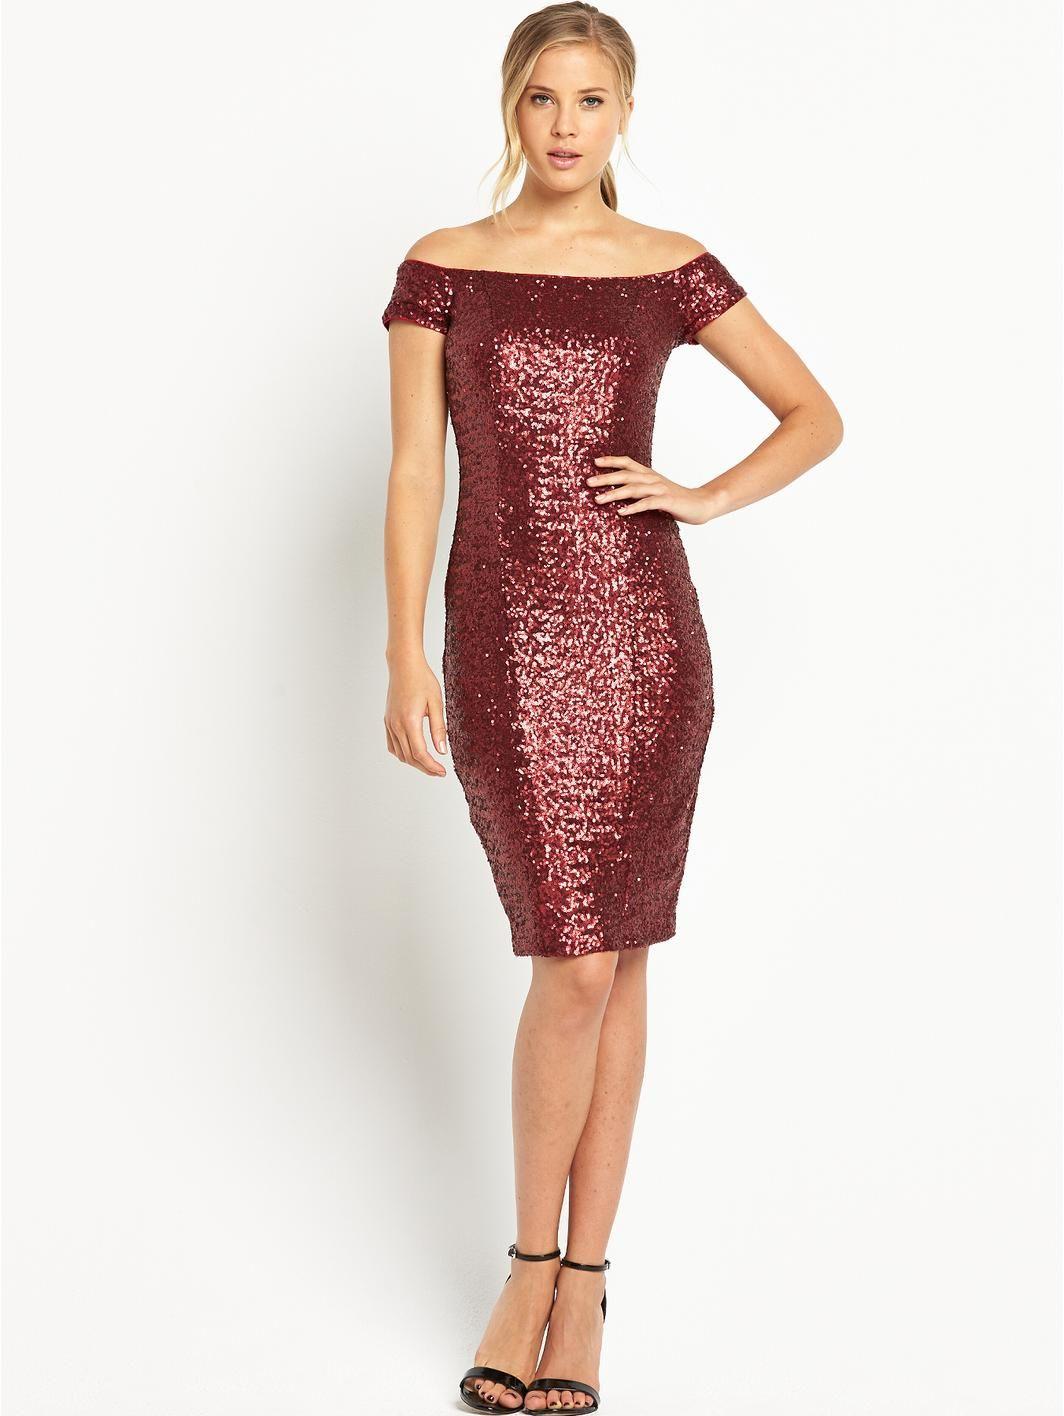 Definition Sequin Bandau Red Wine Color Short Dress With Black Shoes Dresses Fashion Clothes For Women [ 1416 x 1064 Pixel ]